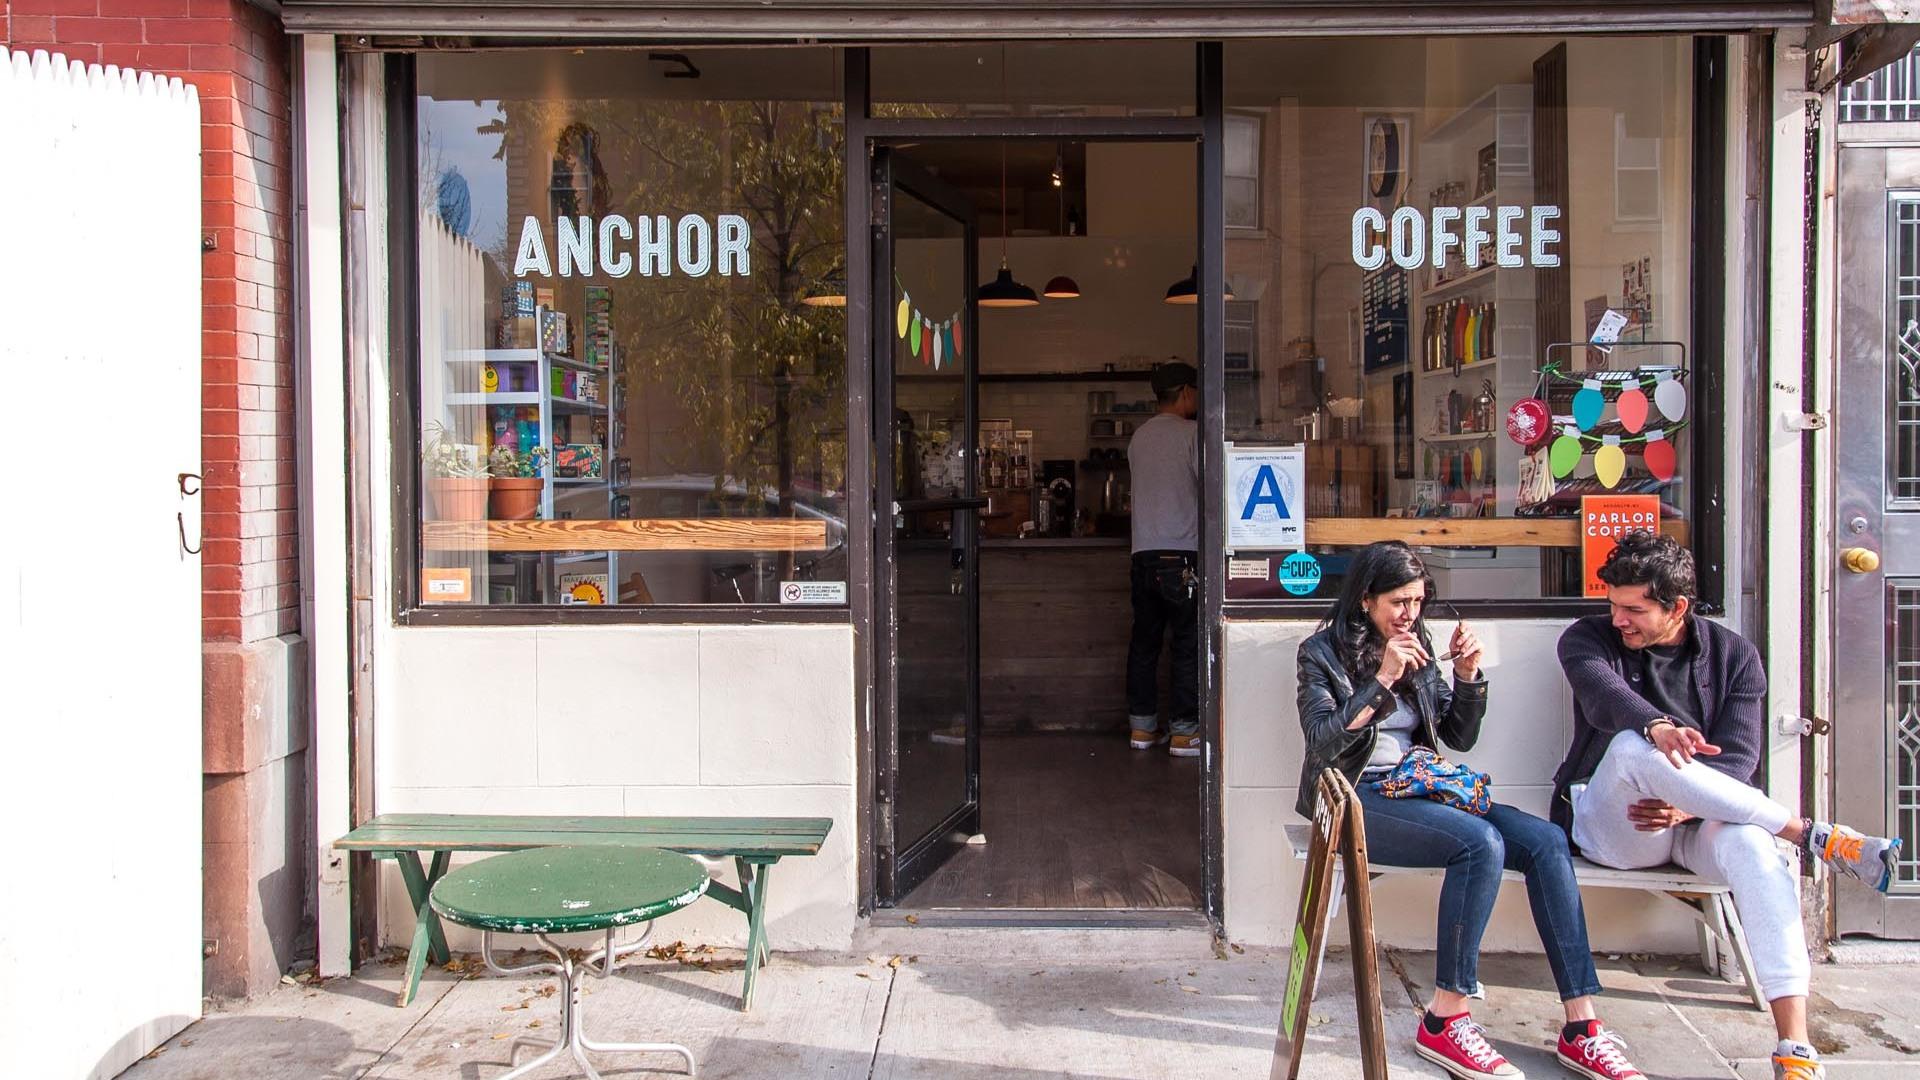 Anchor coffee 9